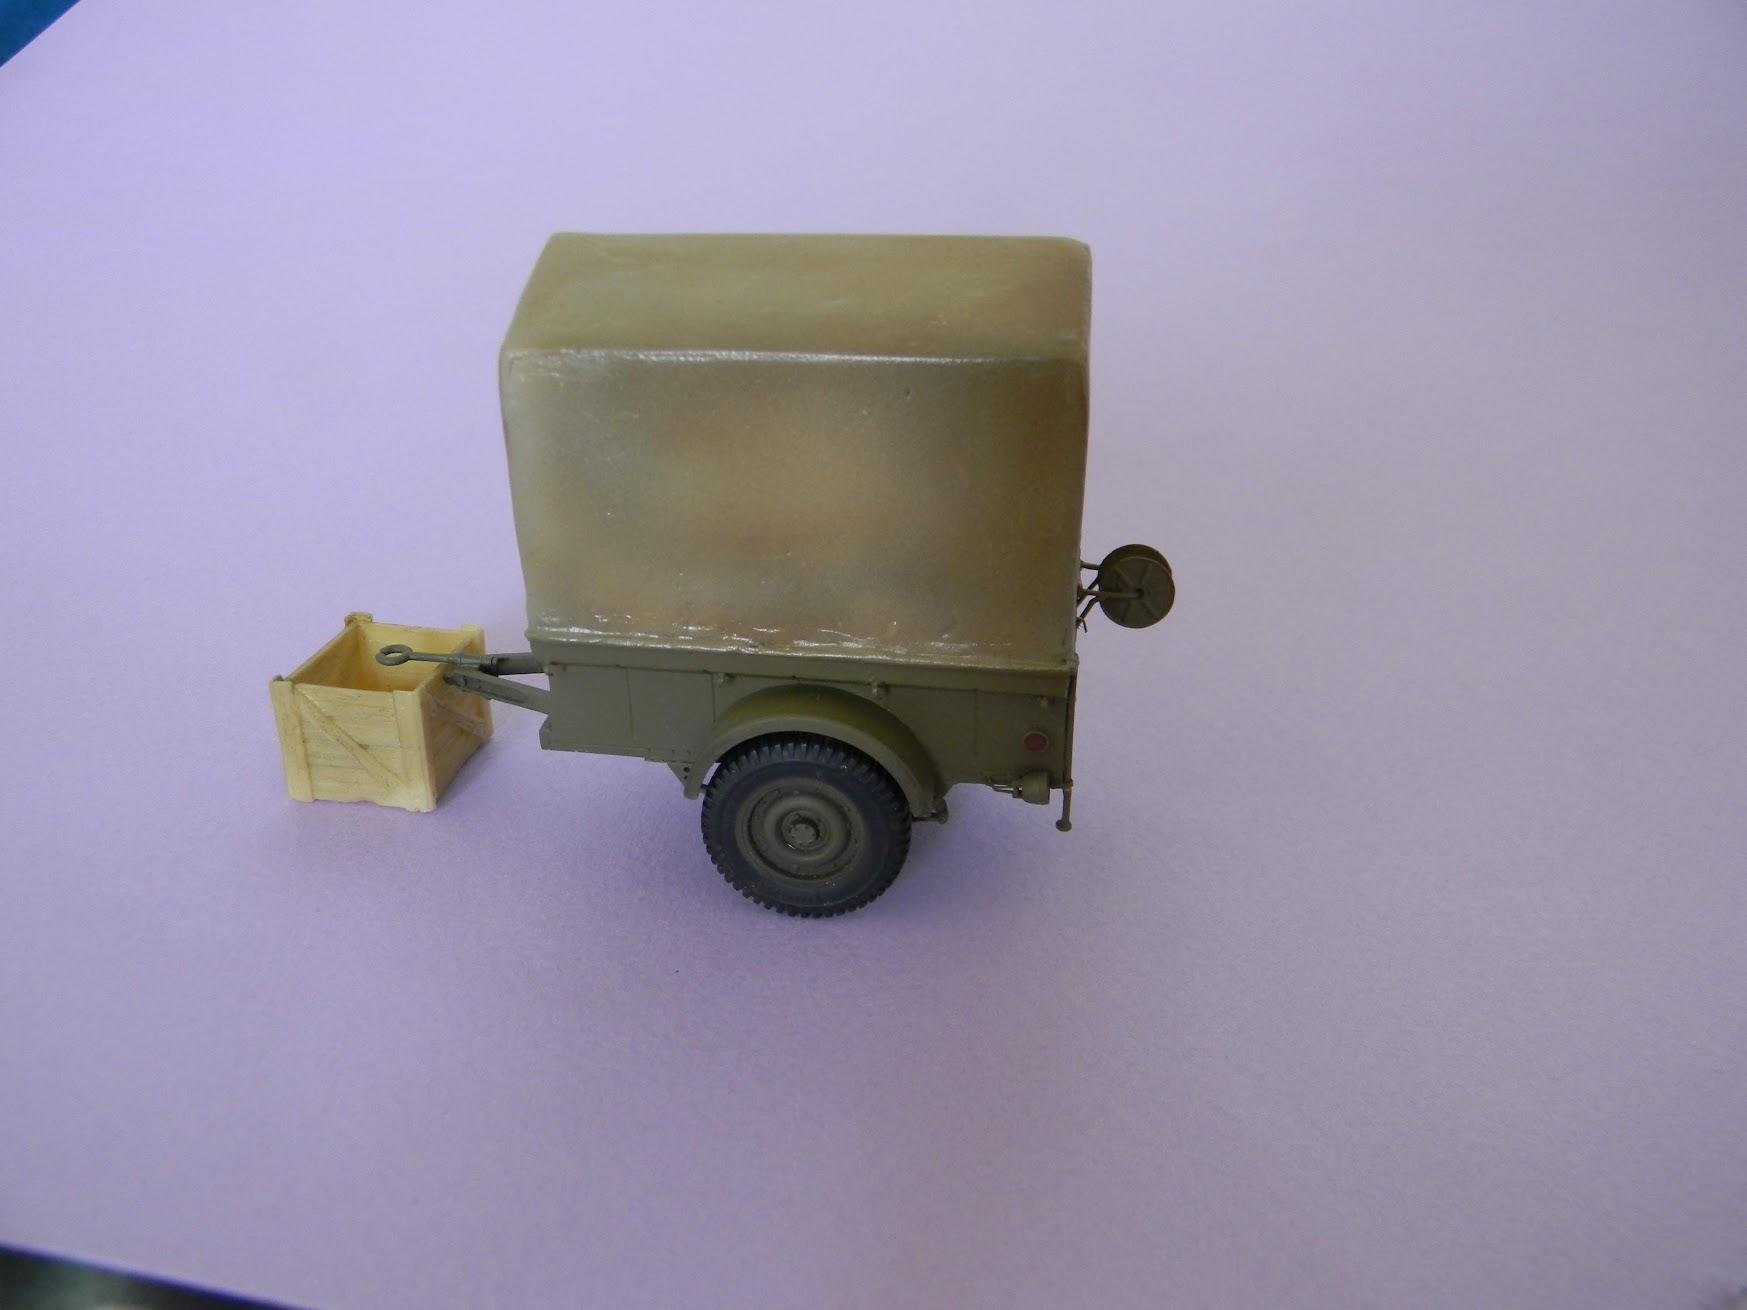 GPW 1942 Ford Bronco Model : revue de détail et montage - Page 5 SSIGLBPSu70vgOUPGU0Rdi4S56N2SG5XSP8Vyp3tRQ8rGWMqCP1TBS4cVg4tGYACdwF_K7OG2RcS9qtac-69uCfJrHRYoJyImQiOM1eGQjc4Yuzd6pCVsk7xVgrGS4SgiY9HH7Ux42QVza0CaL3S7bYjHYJ5a3JvoZDs7IDQLMiCCVTiXpA1e1T6mnICsXwP0ld_GyBdwezJyvC91xAwHGy79-Dpu8X91N7eD2bo2vtIoegBqoratKZWzH2ILejdHHgisEi-JeYLVoUpAQ60rsFv--xIAKB3BSfwnidmUOM9ZafRrJfSblItViuzeCjQXmsikWUoW8ytYOQSUzJh8rRNwiLlLgidQ50rR7HOzntYiUZzFJ7qgpm5LWBNfslkGi9Wj5N9etvaSPWa7rg555knXyodHnsx1OfLF8lY66pX6F9IoMK4H0l9CstEB7ynysDbk7psdkr9QEYDJEJif4J0-B8ZPFBBoRCVZJWcDtGZLoYTRDjHolFXPJIX-JwnNLT8ksaxxc_KafJxwjuqNxZsTmqE-a4g7YzRMU5O-6mOJrnp6rXMH5PN14HXhnCNHKWVbjAp-jCfSQLbXKe5_t744j7dGGDp_osPSBwuYF-yzWb2co5MSFoYTrCV66TZakHbn9wQs-leLKUits1V-HErQoHAJiSWjQWK1hnJBdJdQN6iiMX94wmpnHCpTHwVr62E0ZDuH5foBgj9J_HXoXQRye6Of7O-9sKo-DxvlwmeMU0fpw=w1747-h1310-no